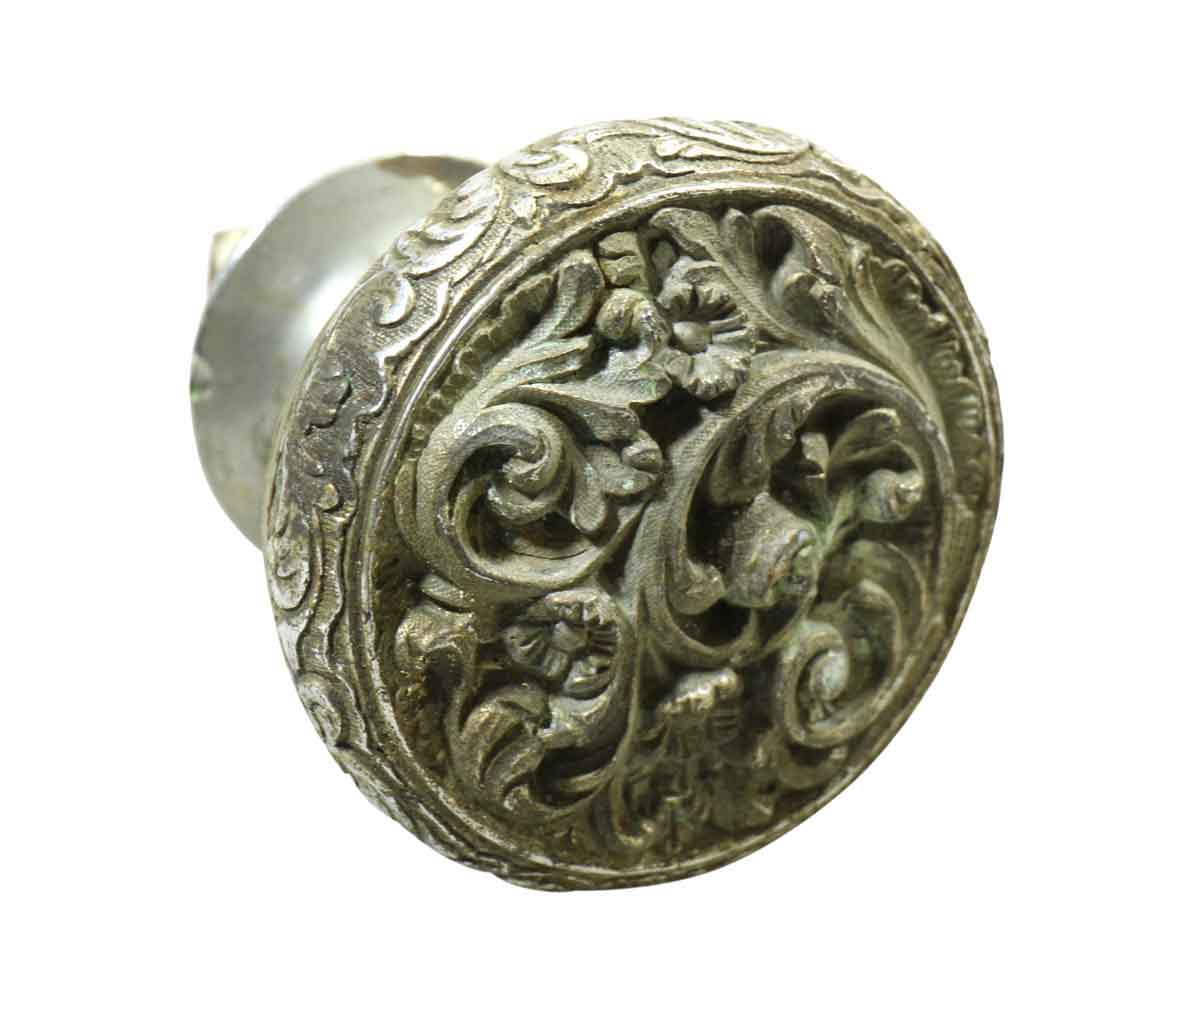 ornate door knobs photo - 15